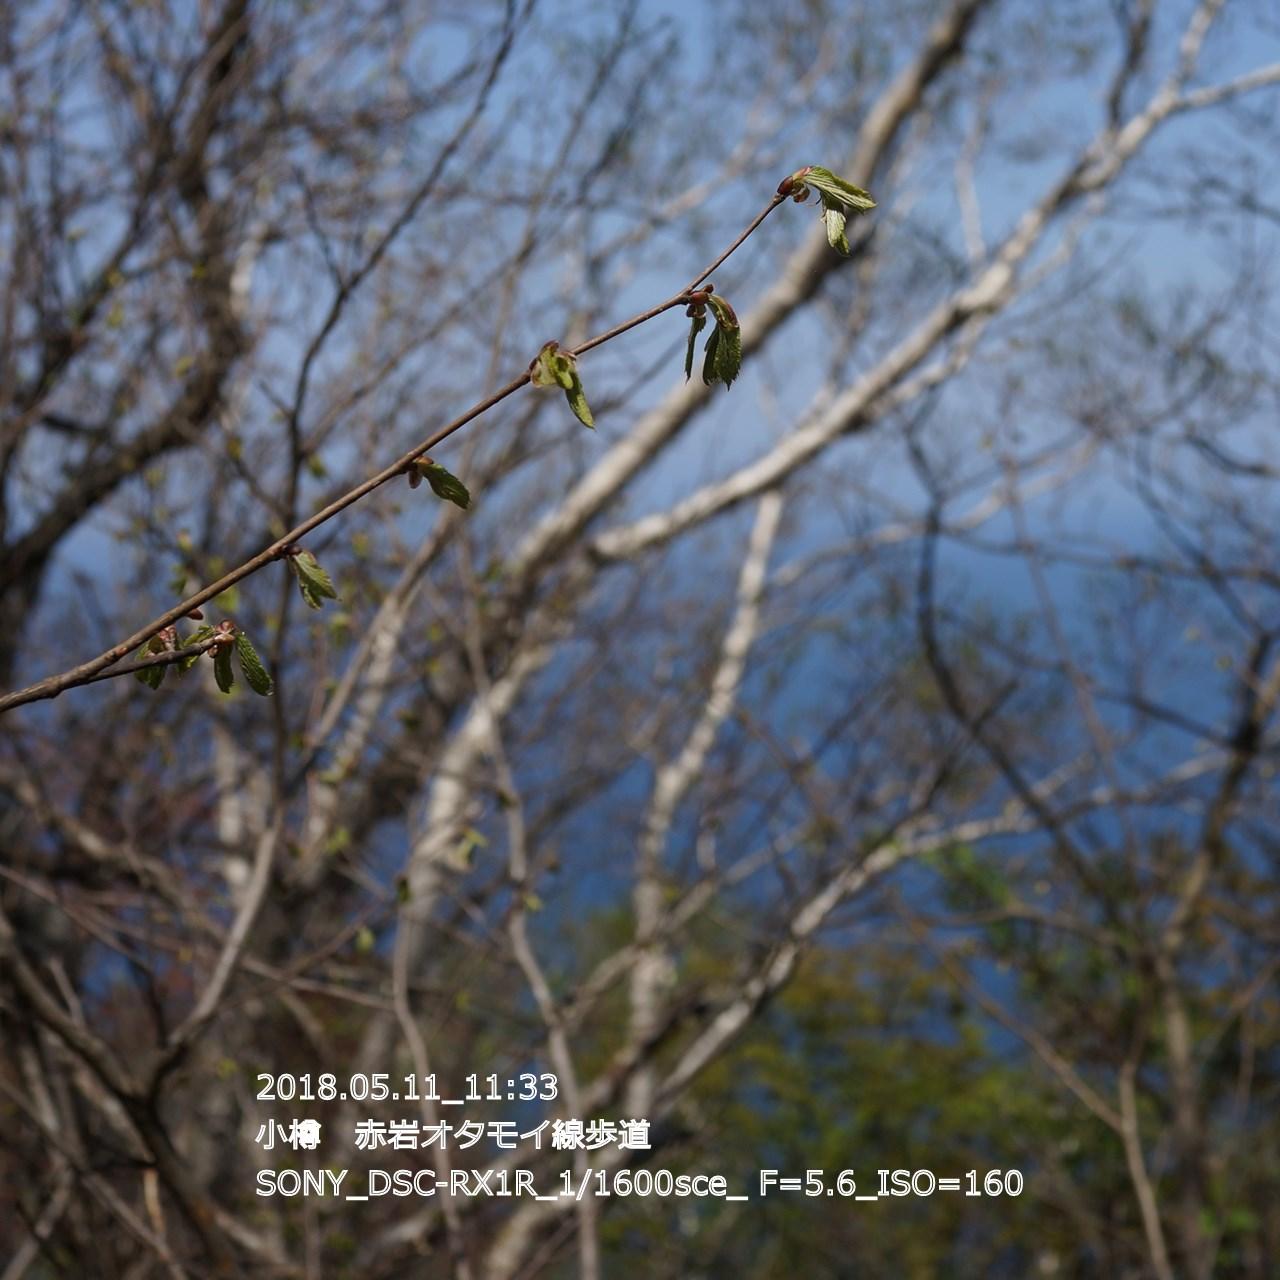 2018/05/11_19:45:18  DSC05308.jpg